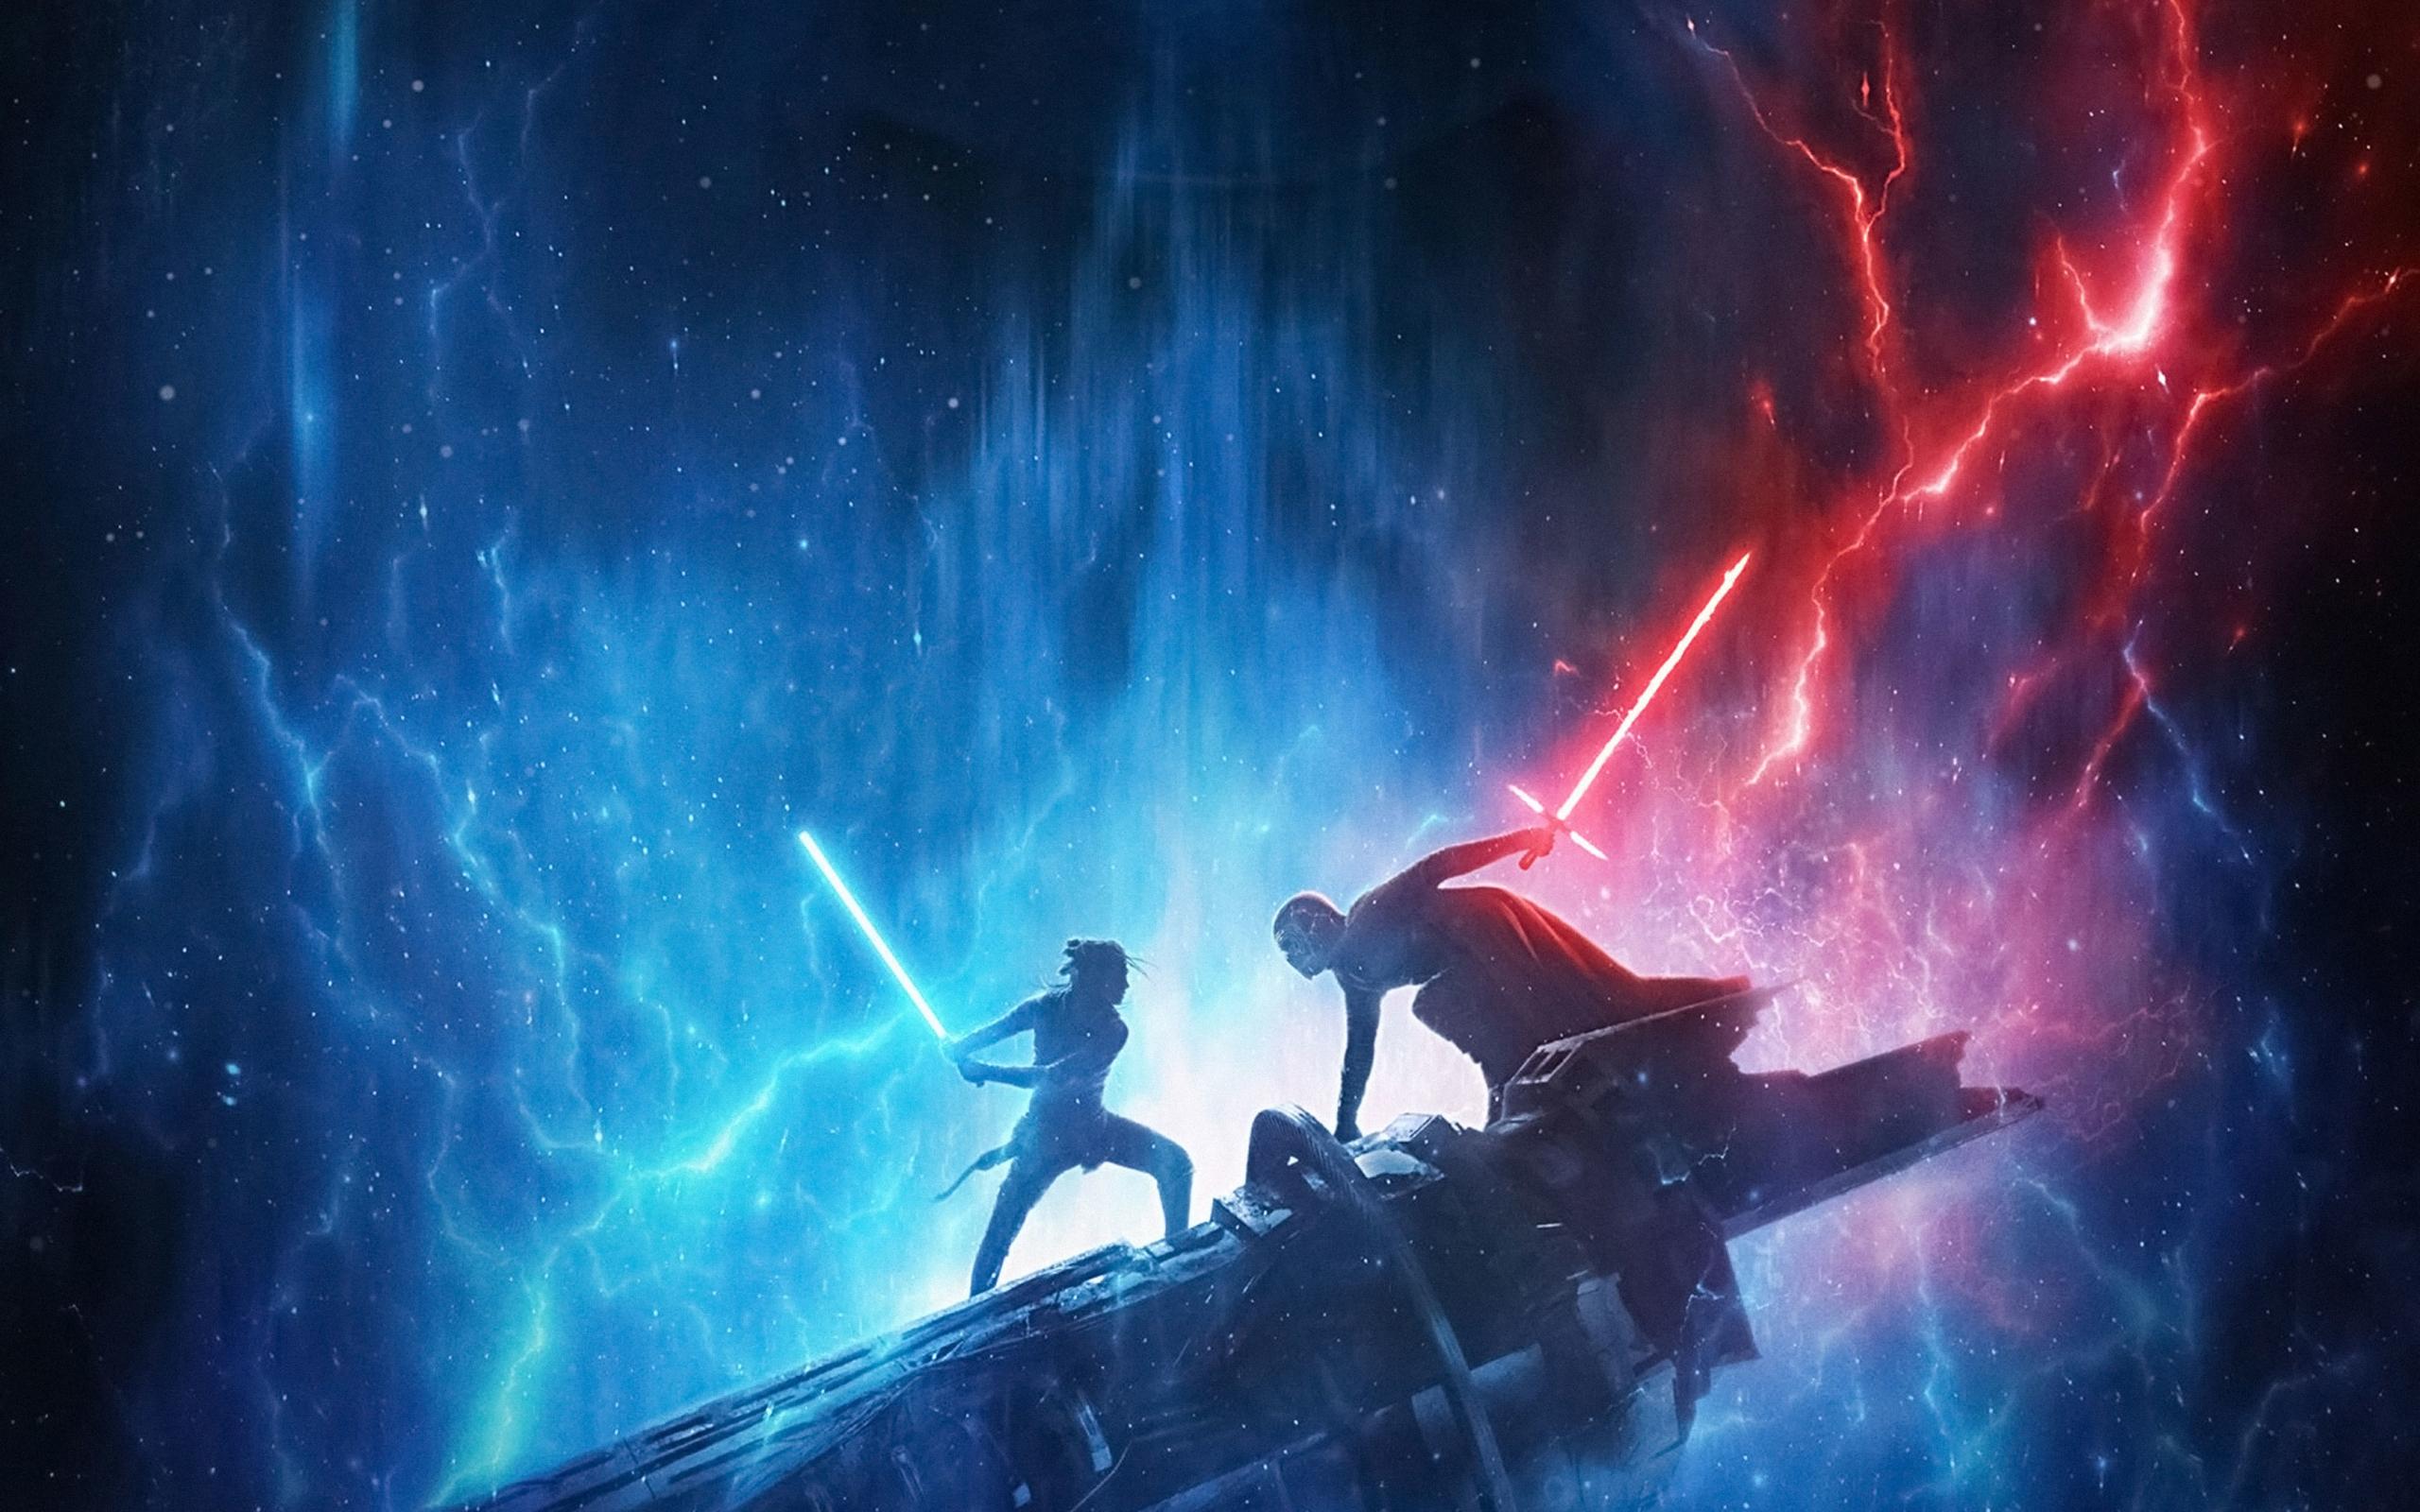 2560x1600 Star Wars The Rise Of Skywalker 2560x1600 Resolution